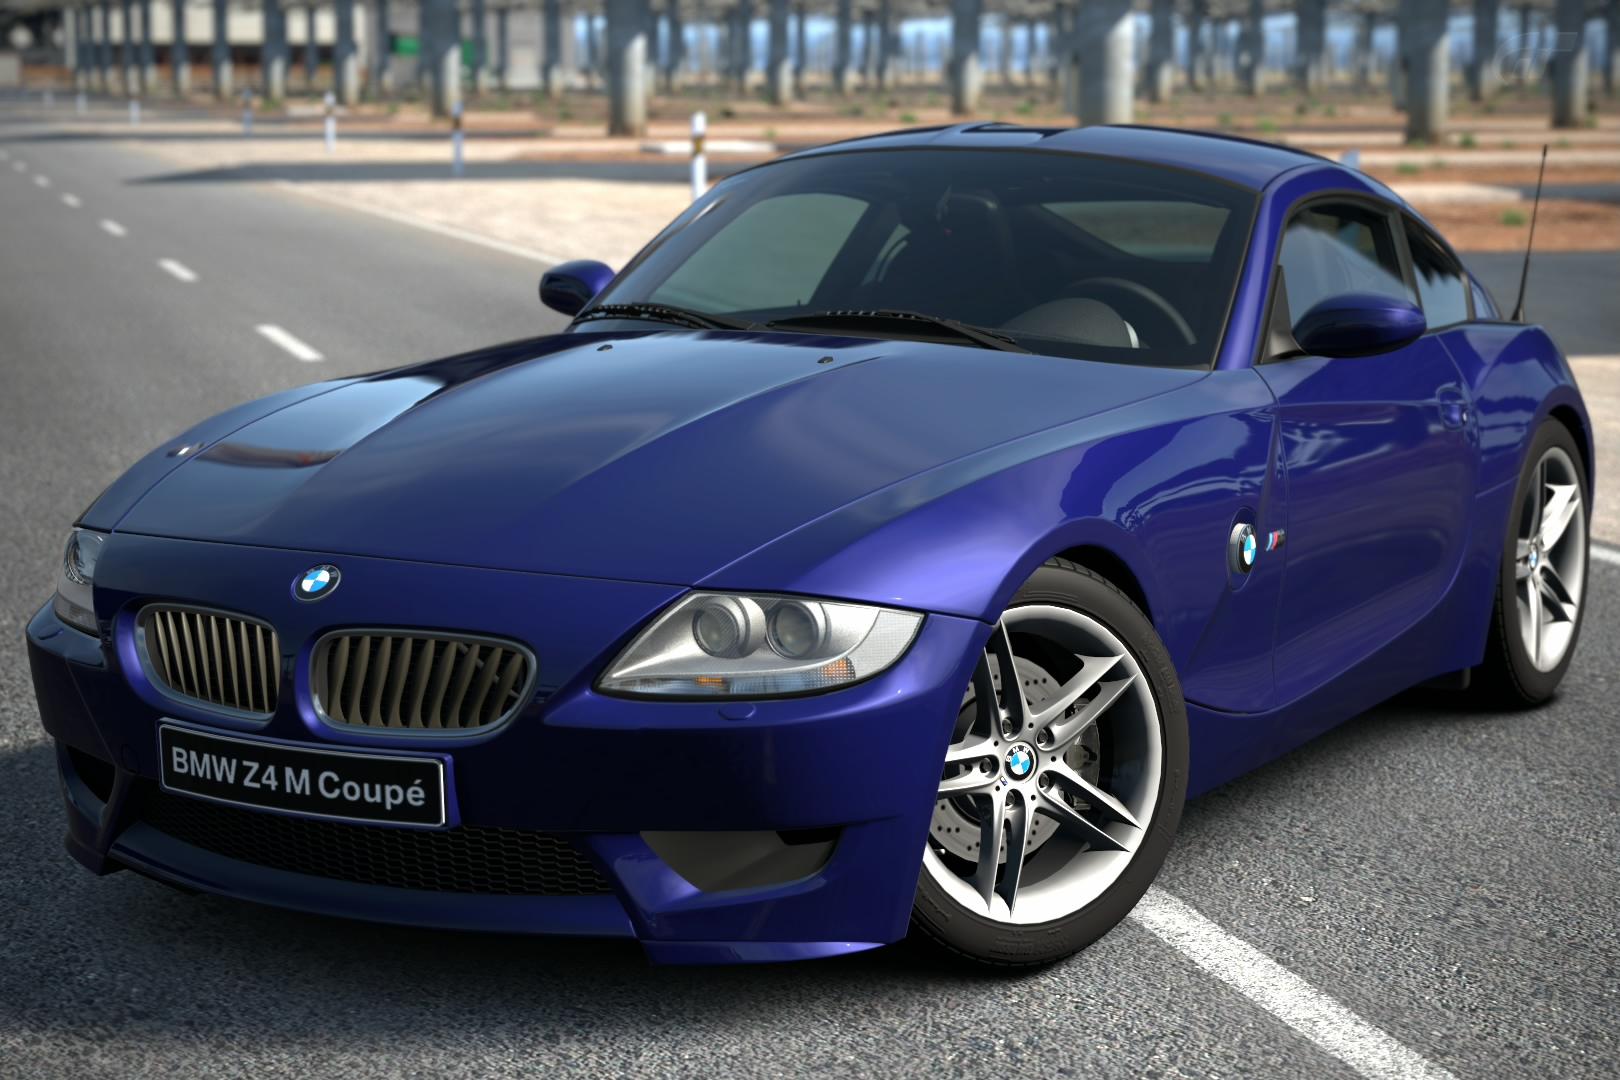 Bmw Z4 M Coupe 08